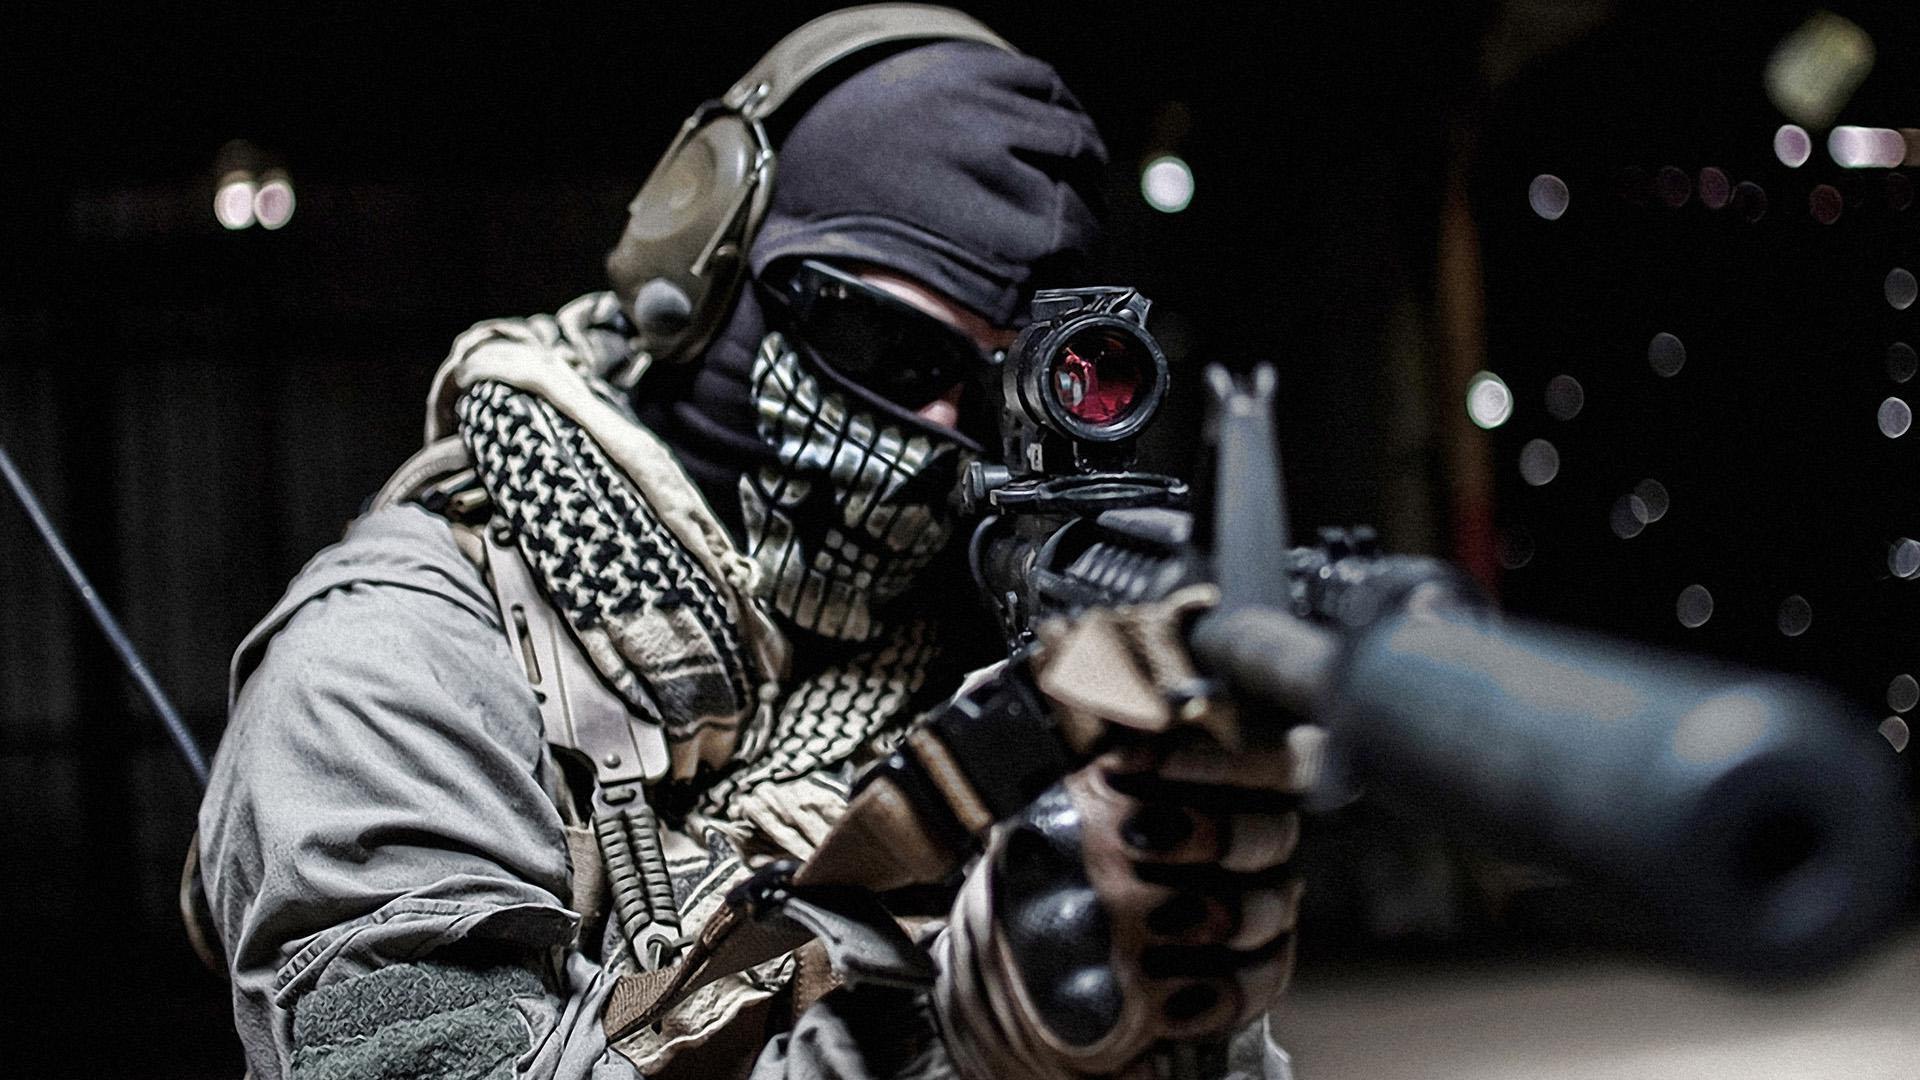 49+] Call of Duty Sniper Wallpaper on